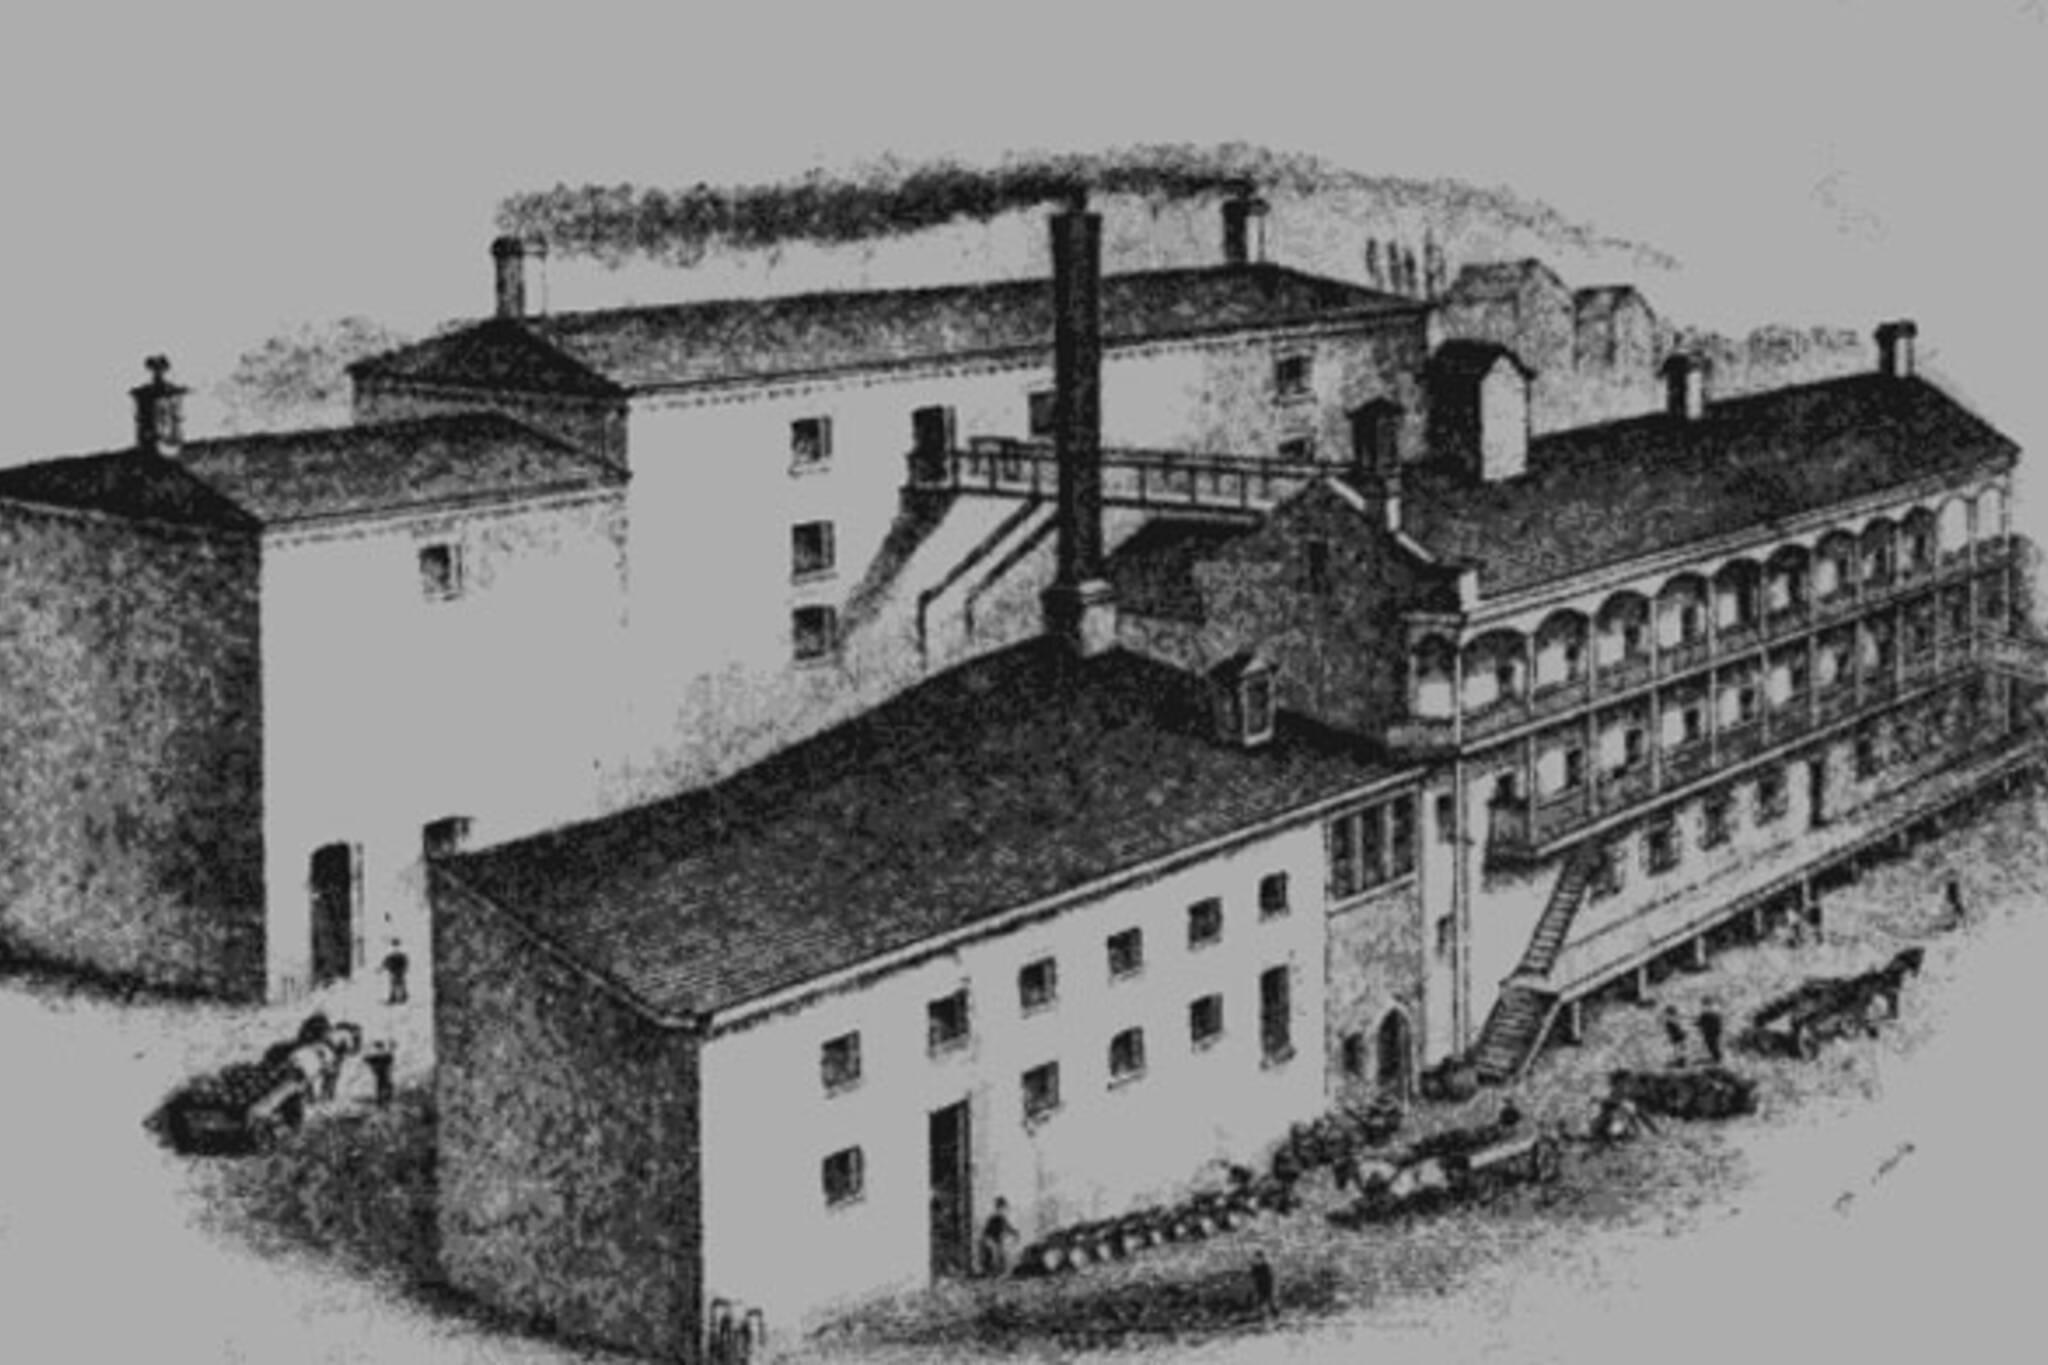 Severns Brewery